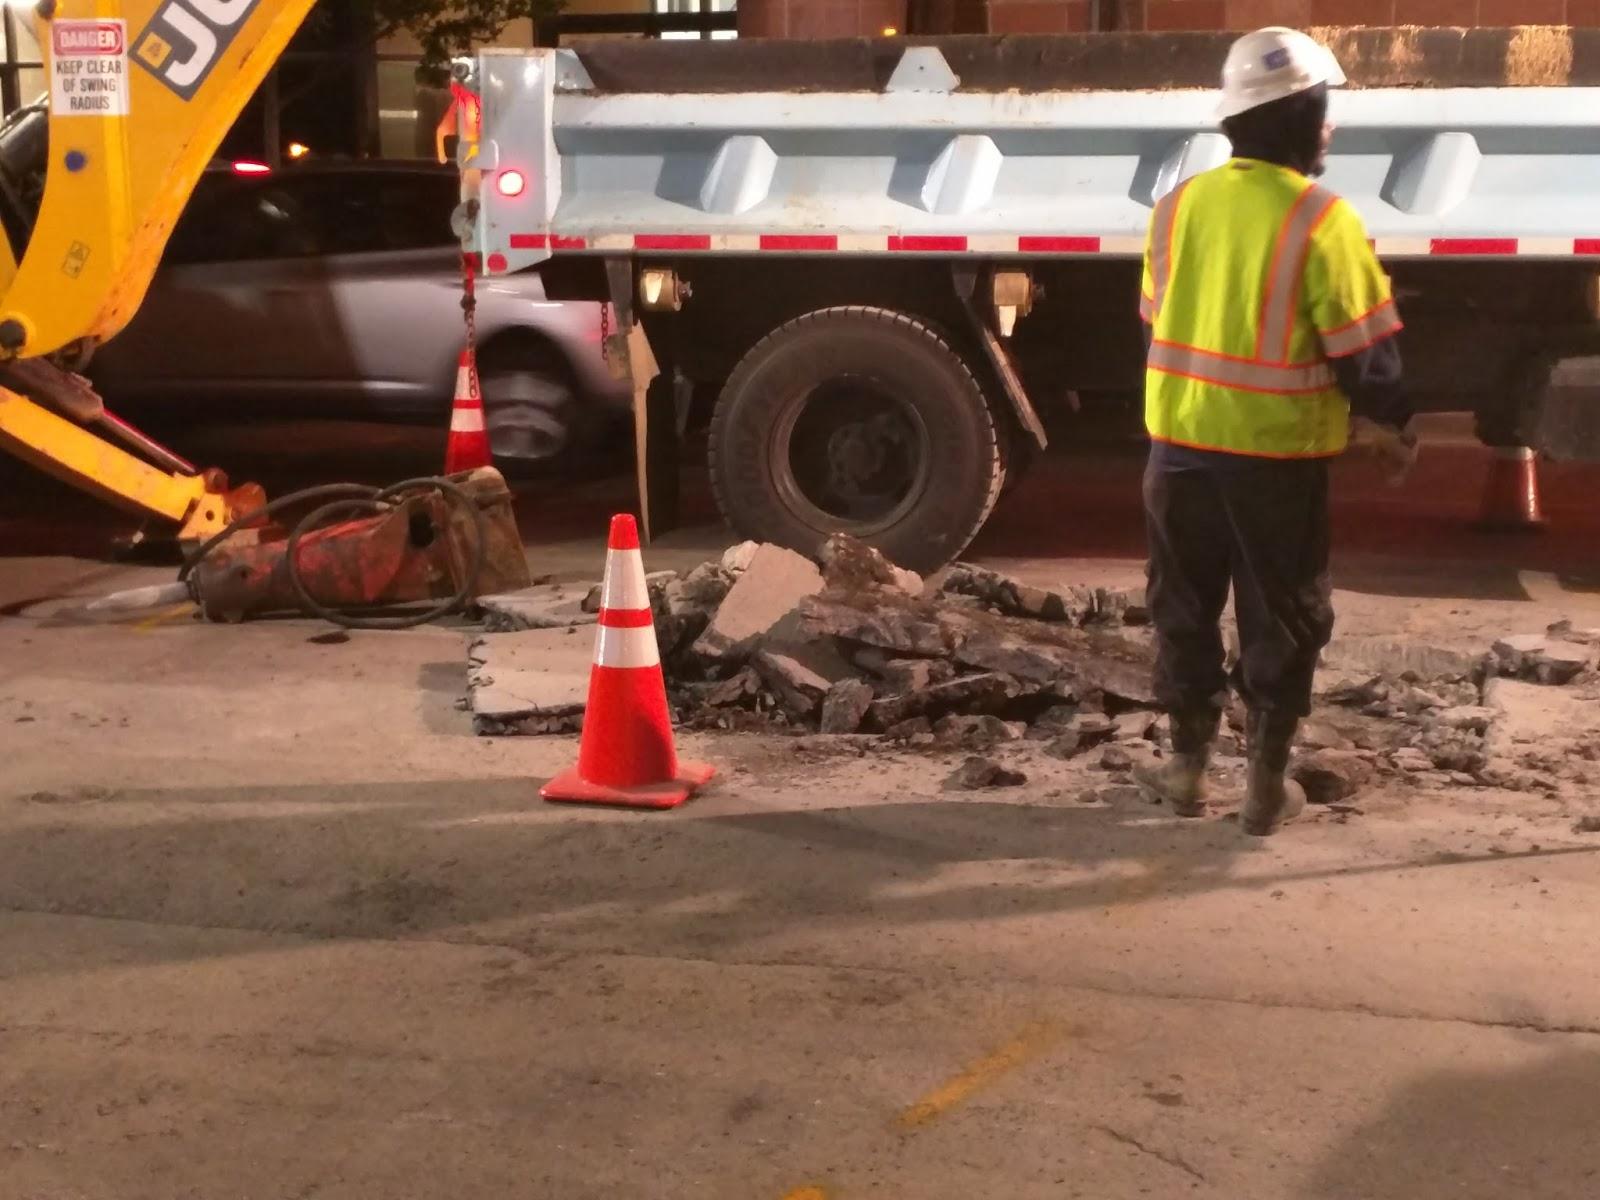 Robert Dyer @ Bethesda Row: Downtown Bethesda water main break wiped ...